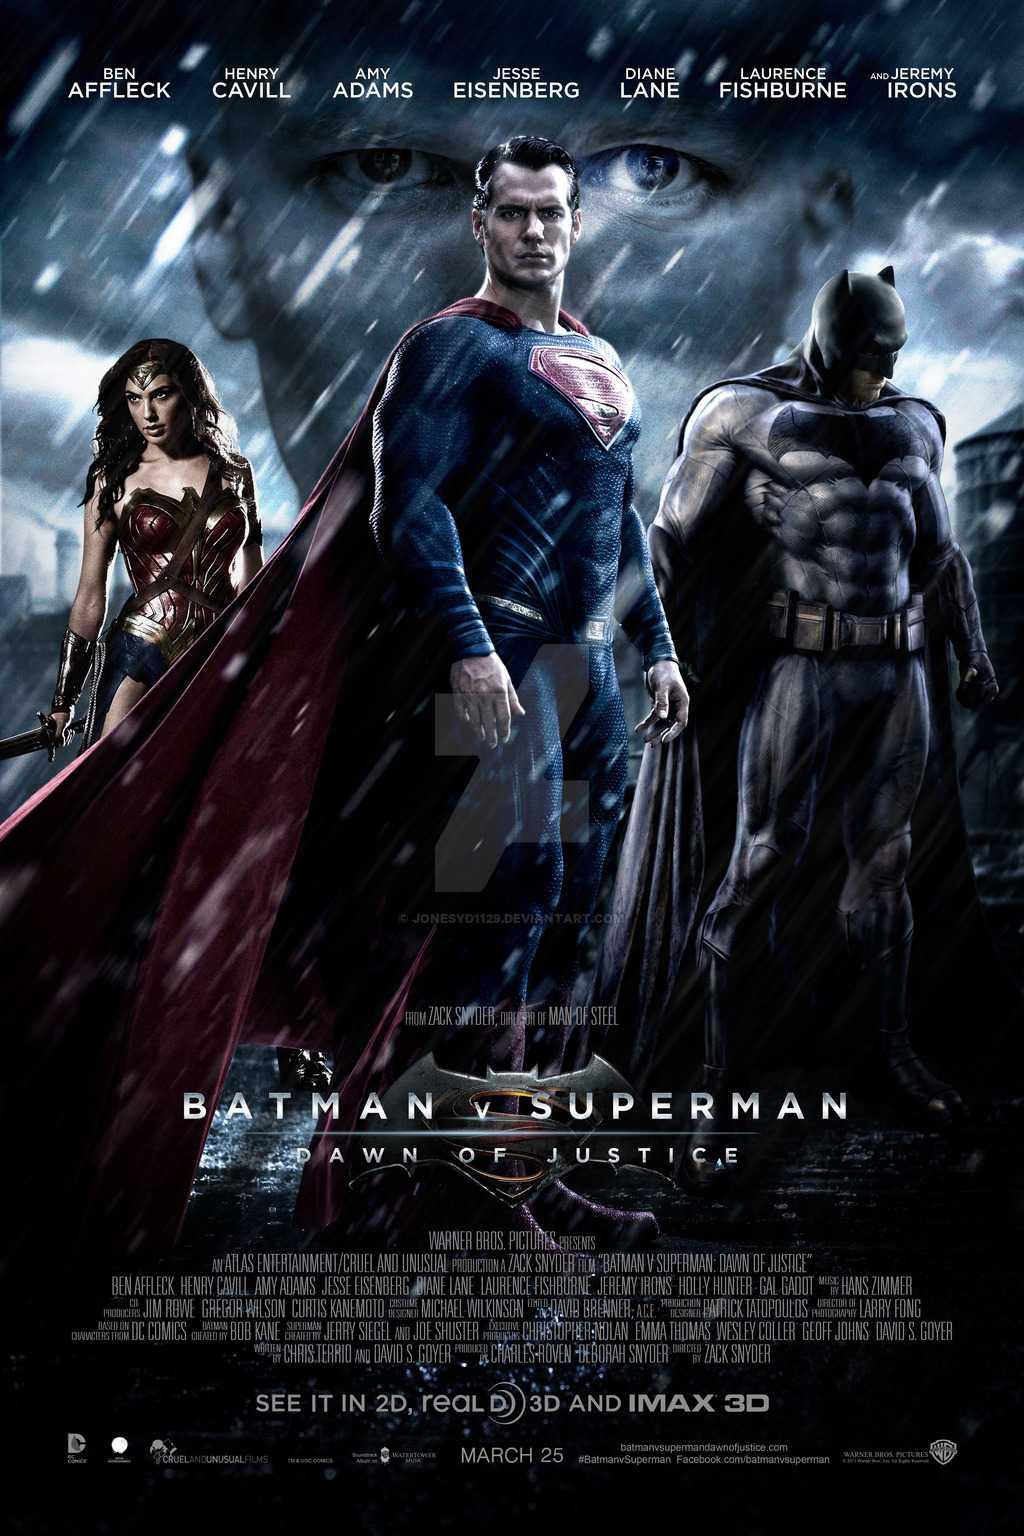 The official Batman vs Superman movie poster